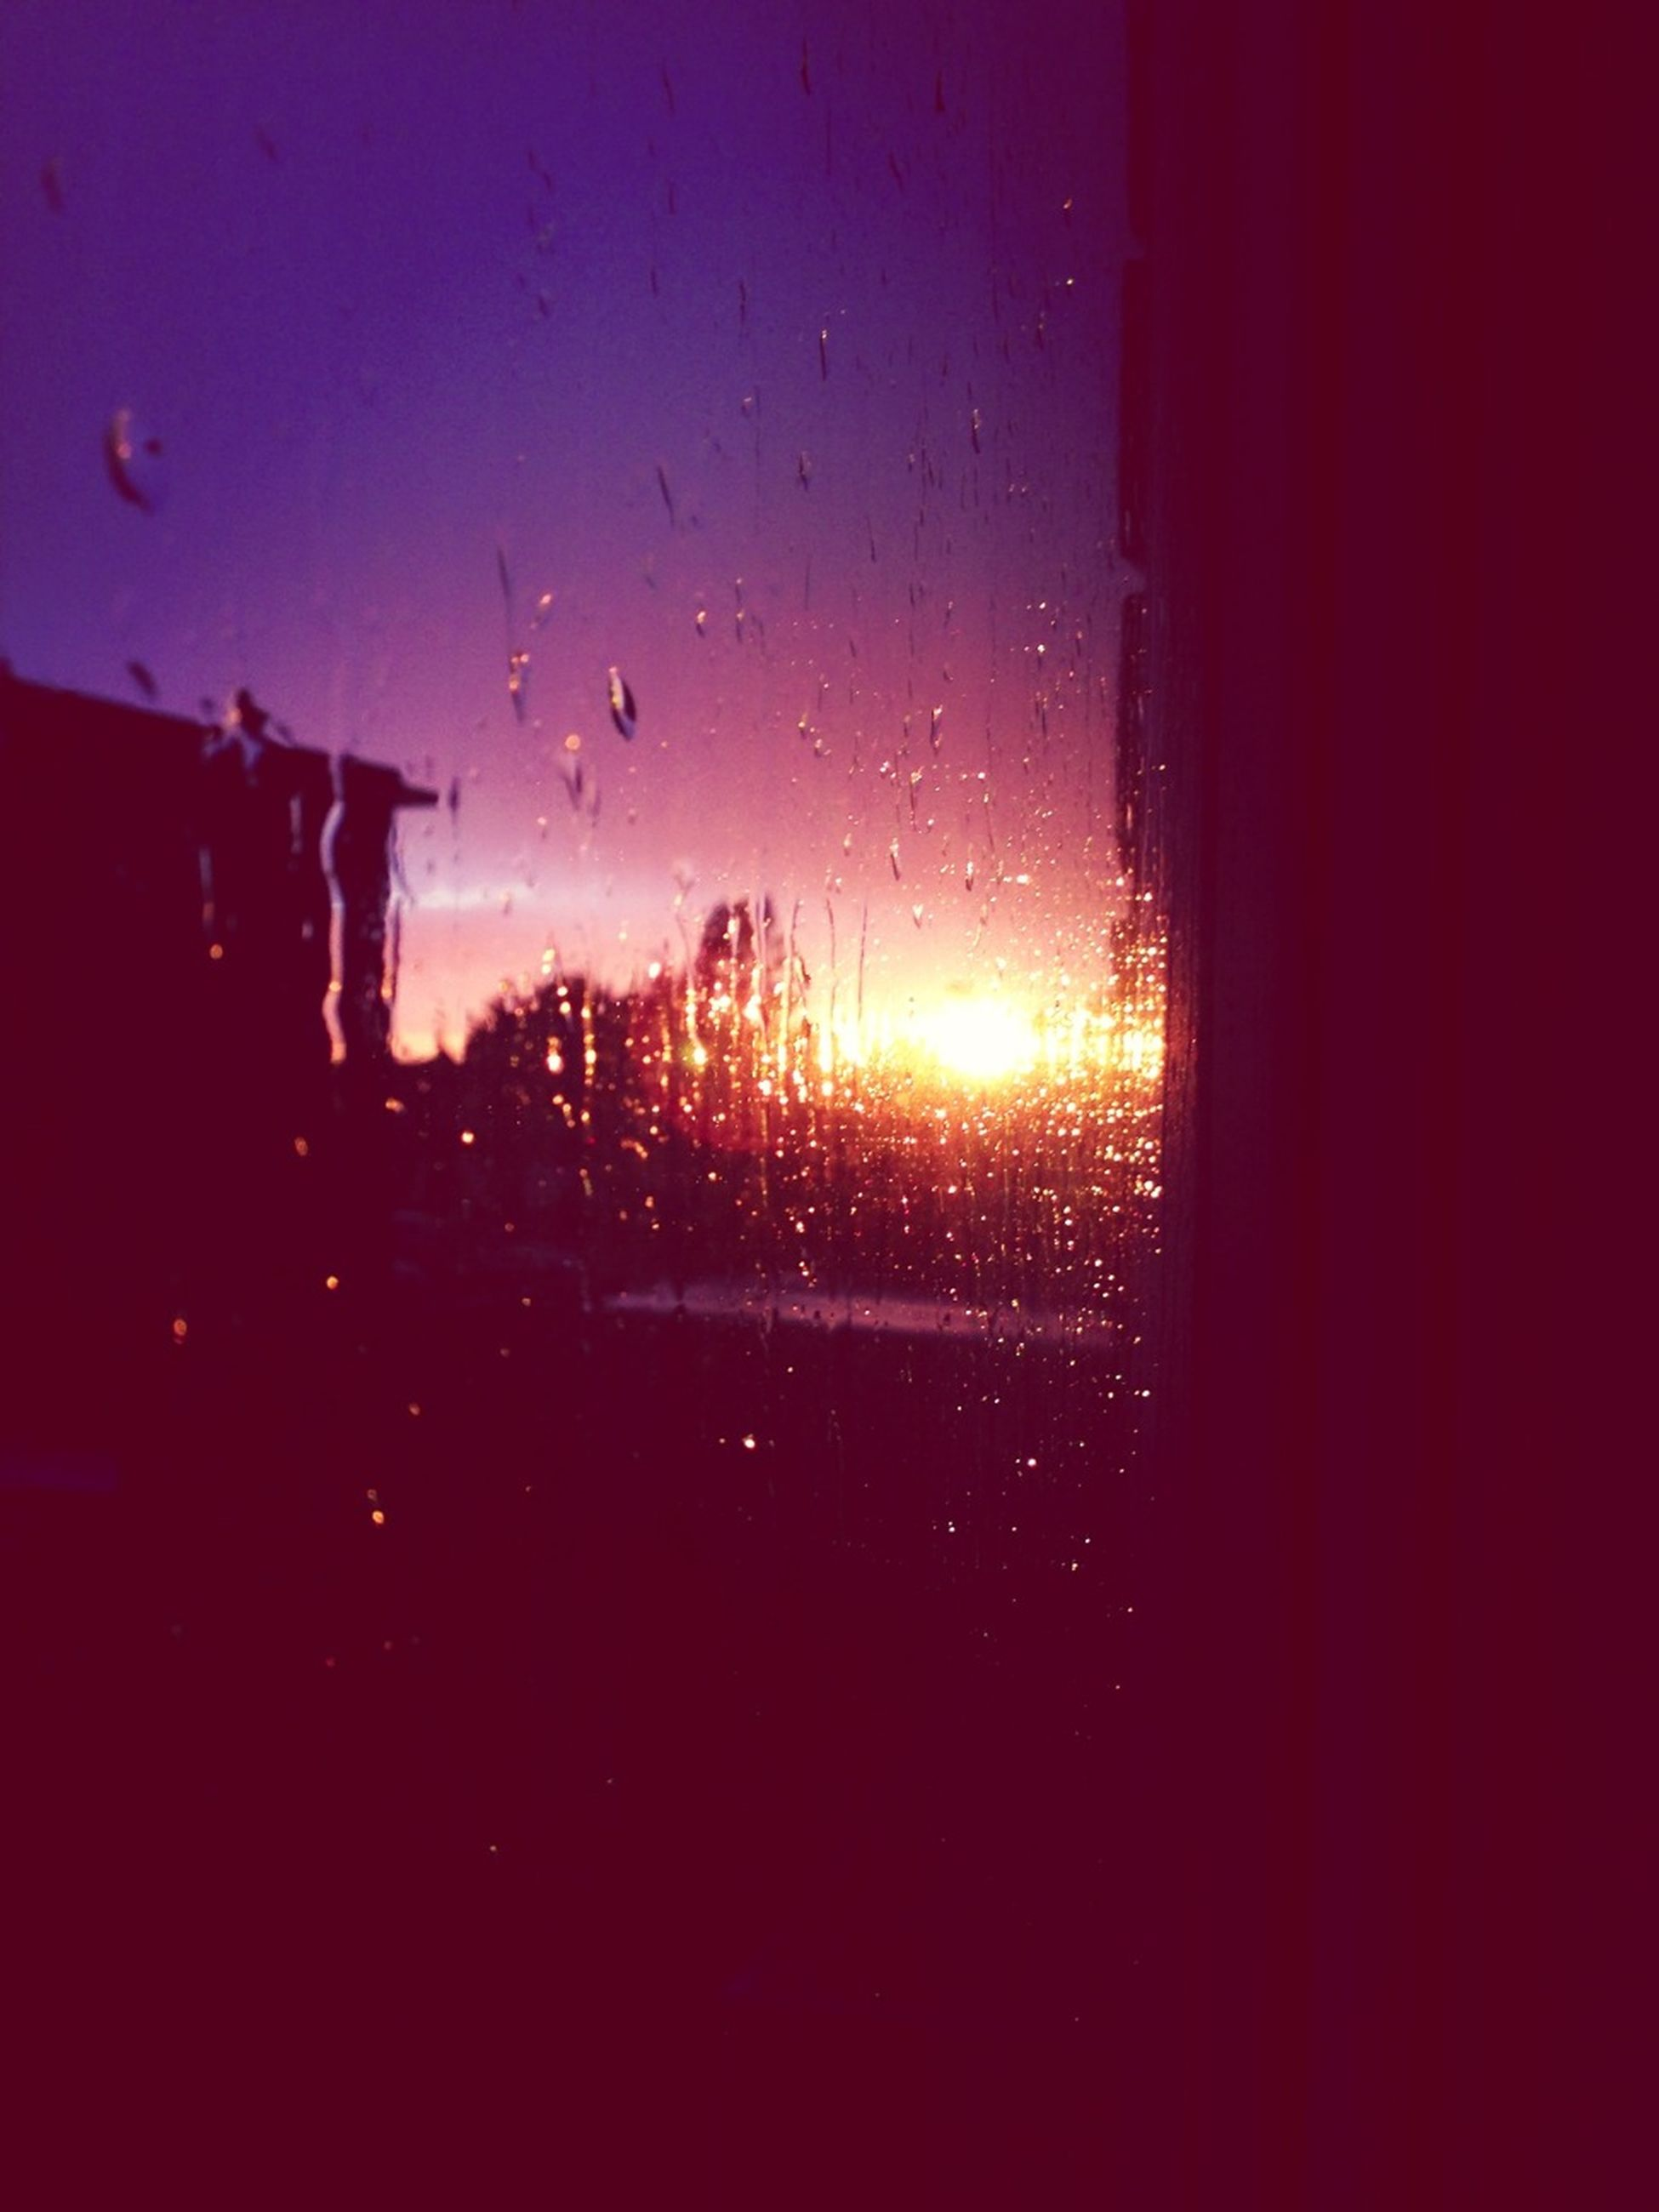 window, transparent, glass - material, sunset, sky, drop, silhouette, indoors, wet, sun, weather, water, nature, rain, no people, dark, glass, beauty in nature, scenics, season